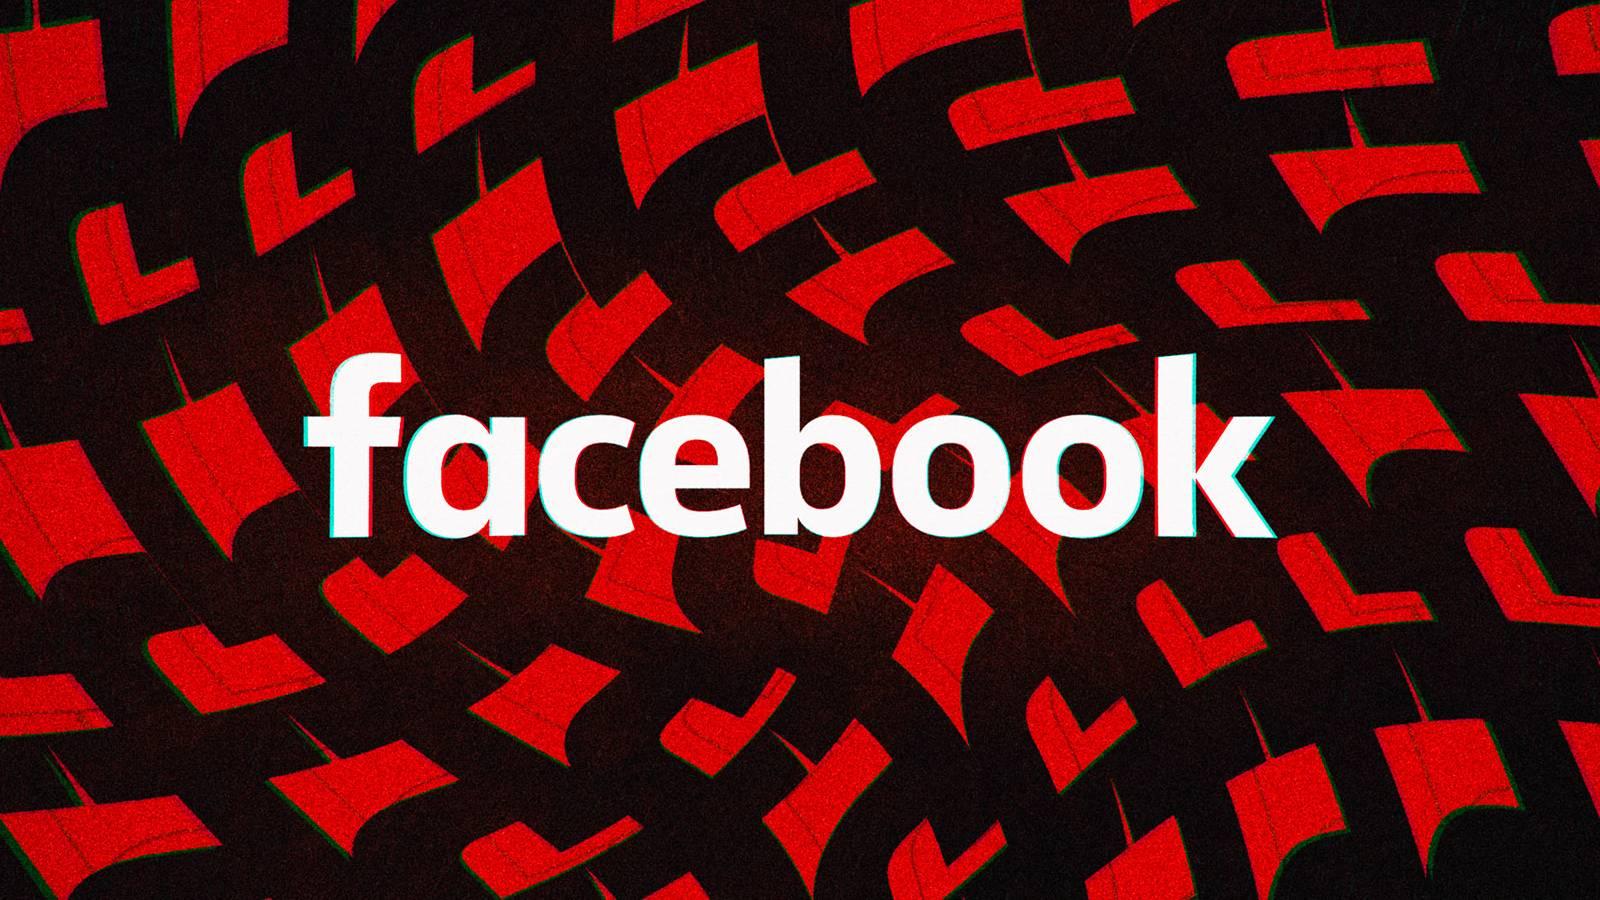 Facebook Update care Vine cu Schimbari pentru Telefoane si Tablete